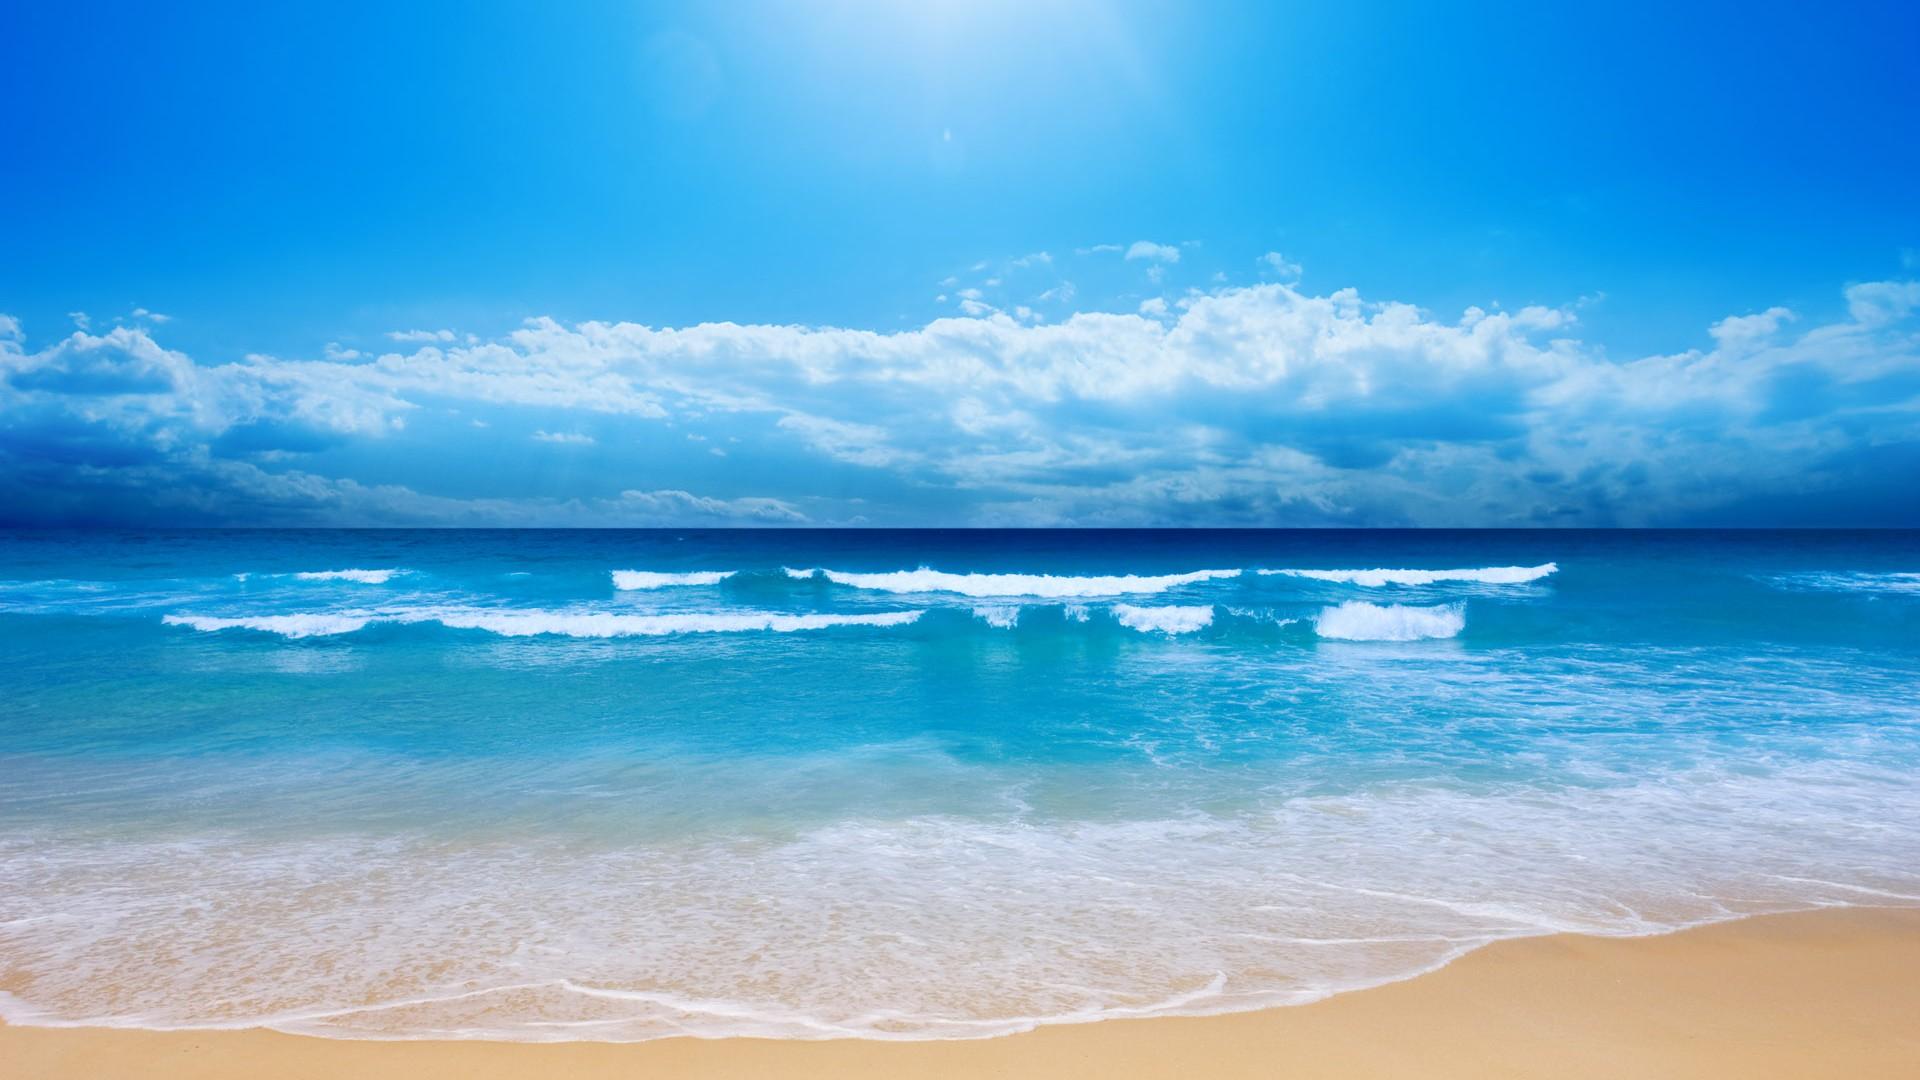 the beautiful seaside scenery - photo #1